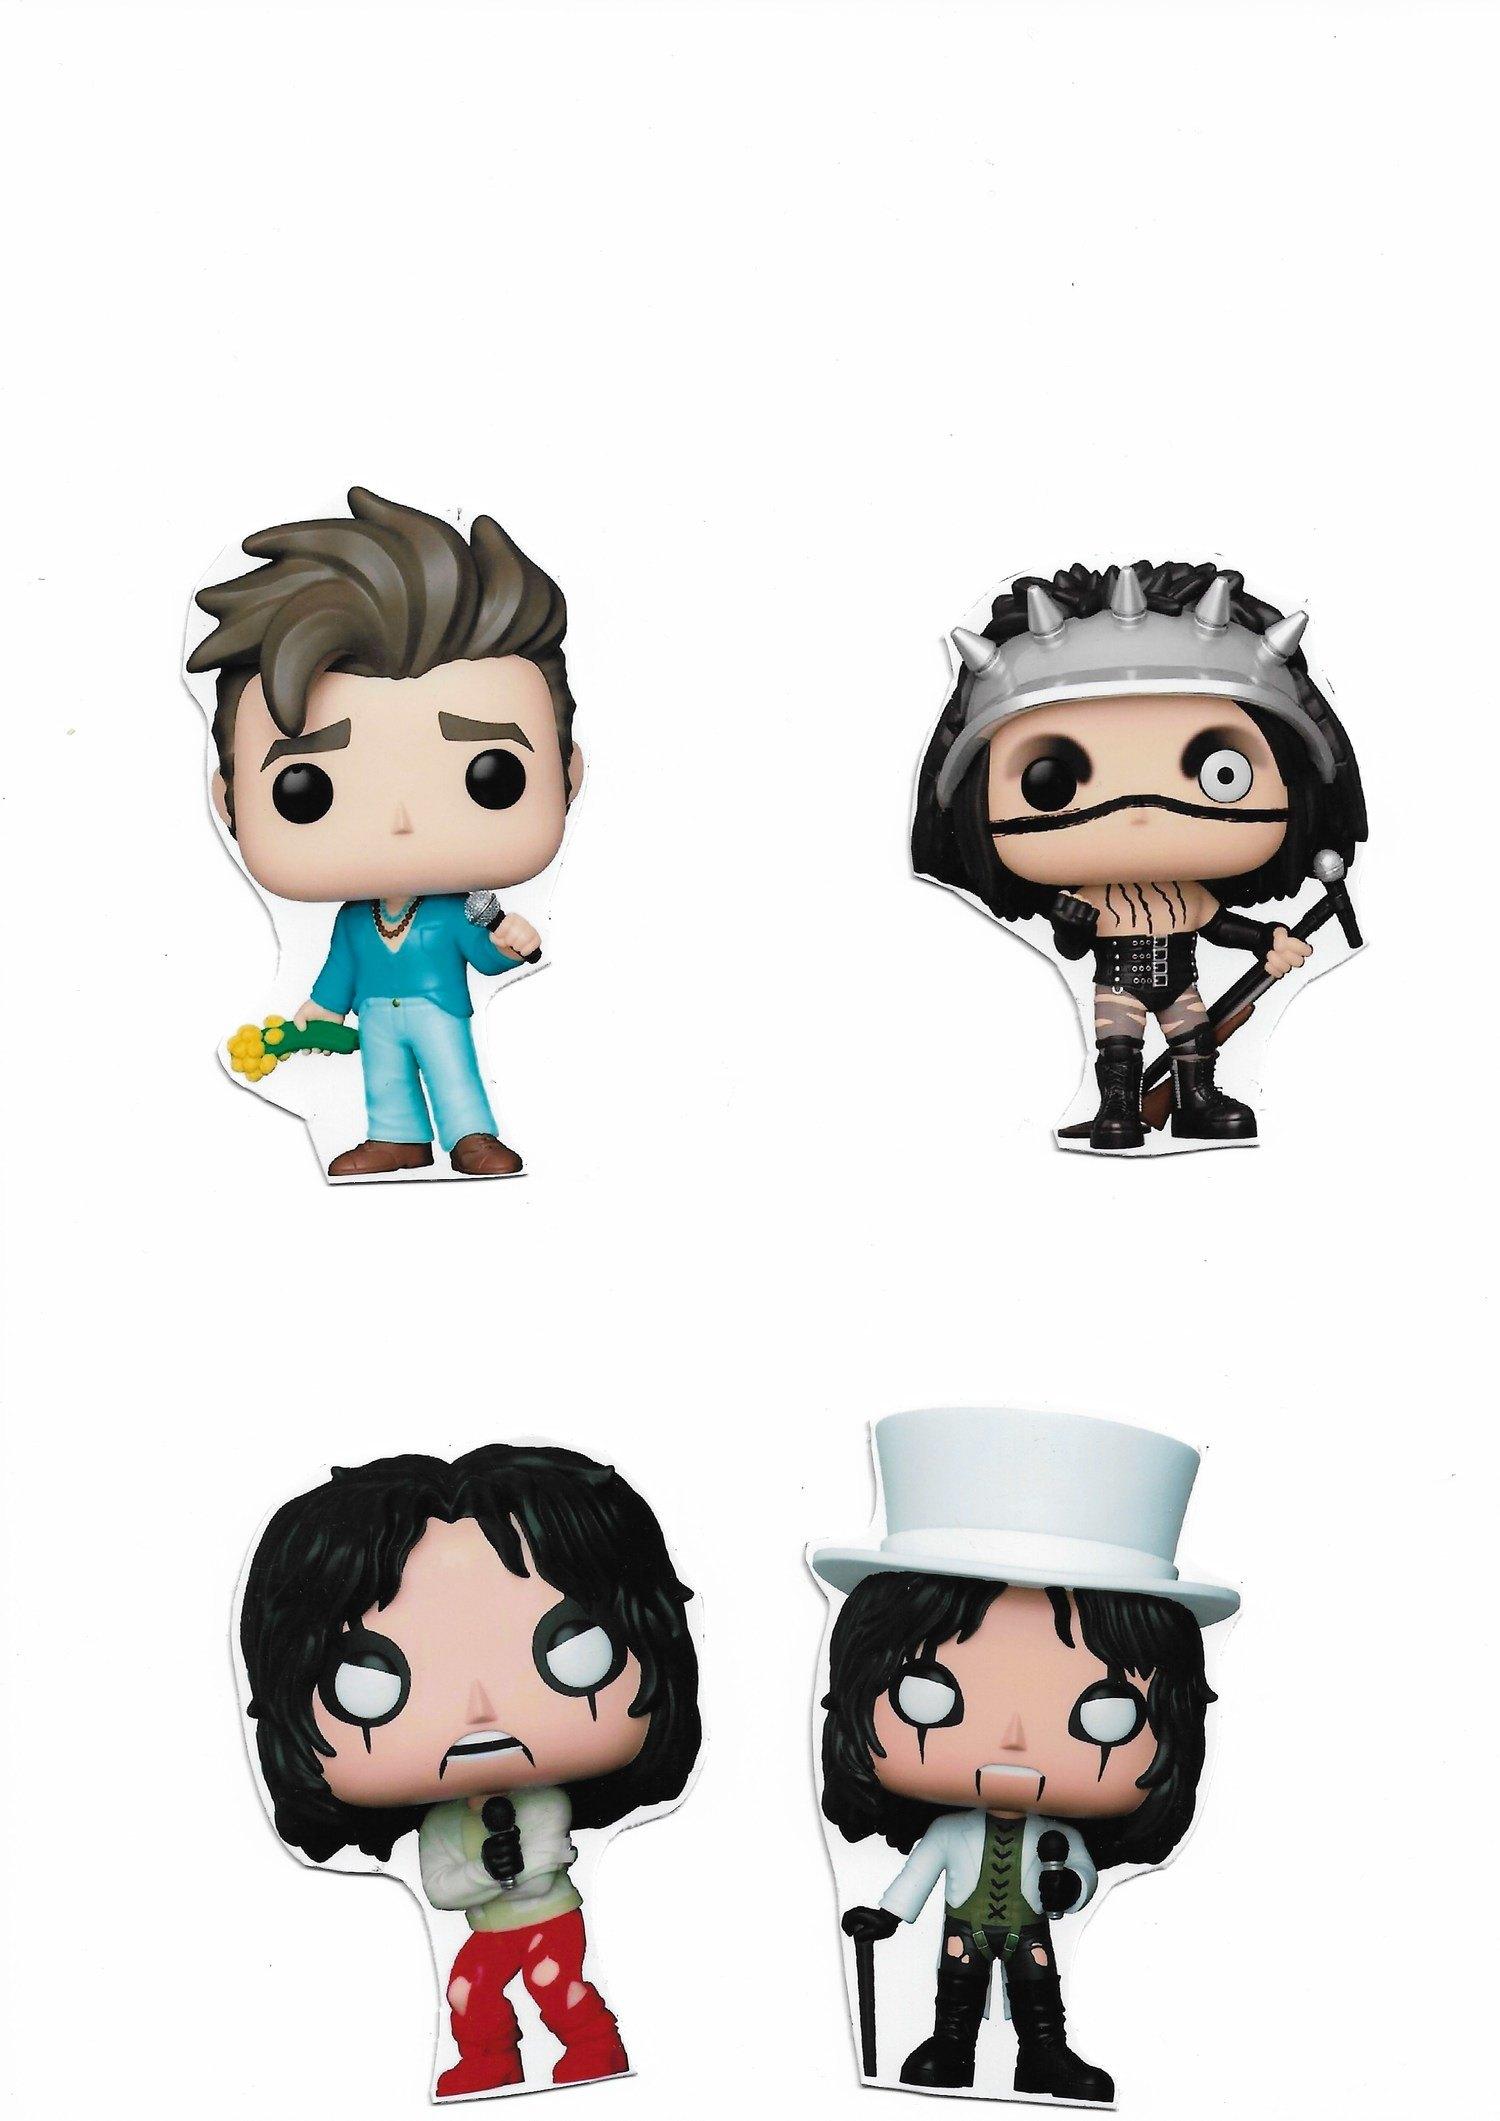 Leve 4 e pague 3: ímãs músicos Marilyn Manson, Alice Cooper e Morrissey